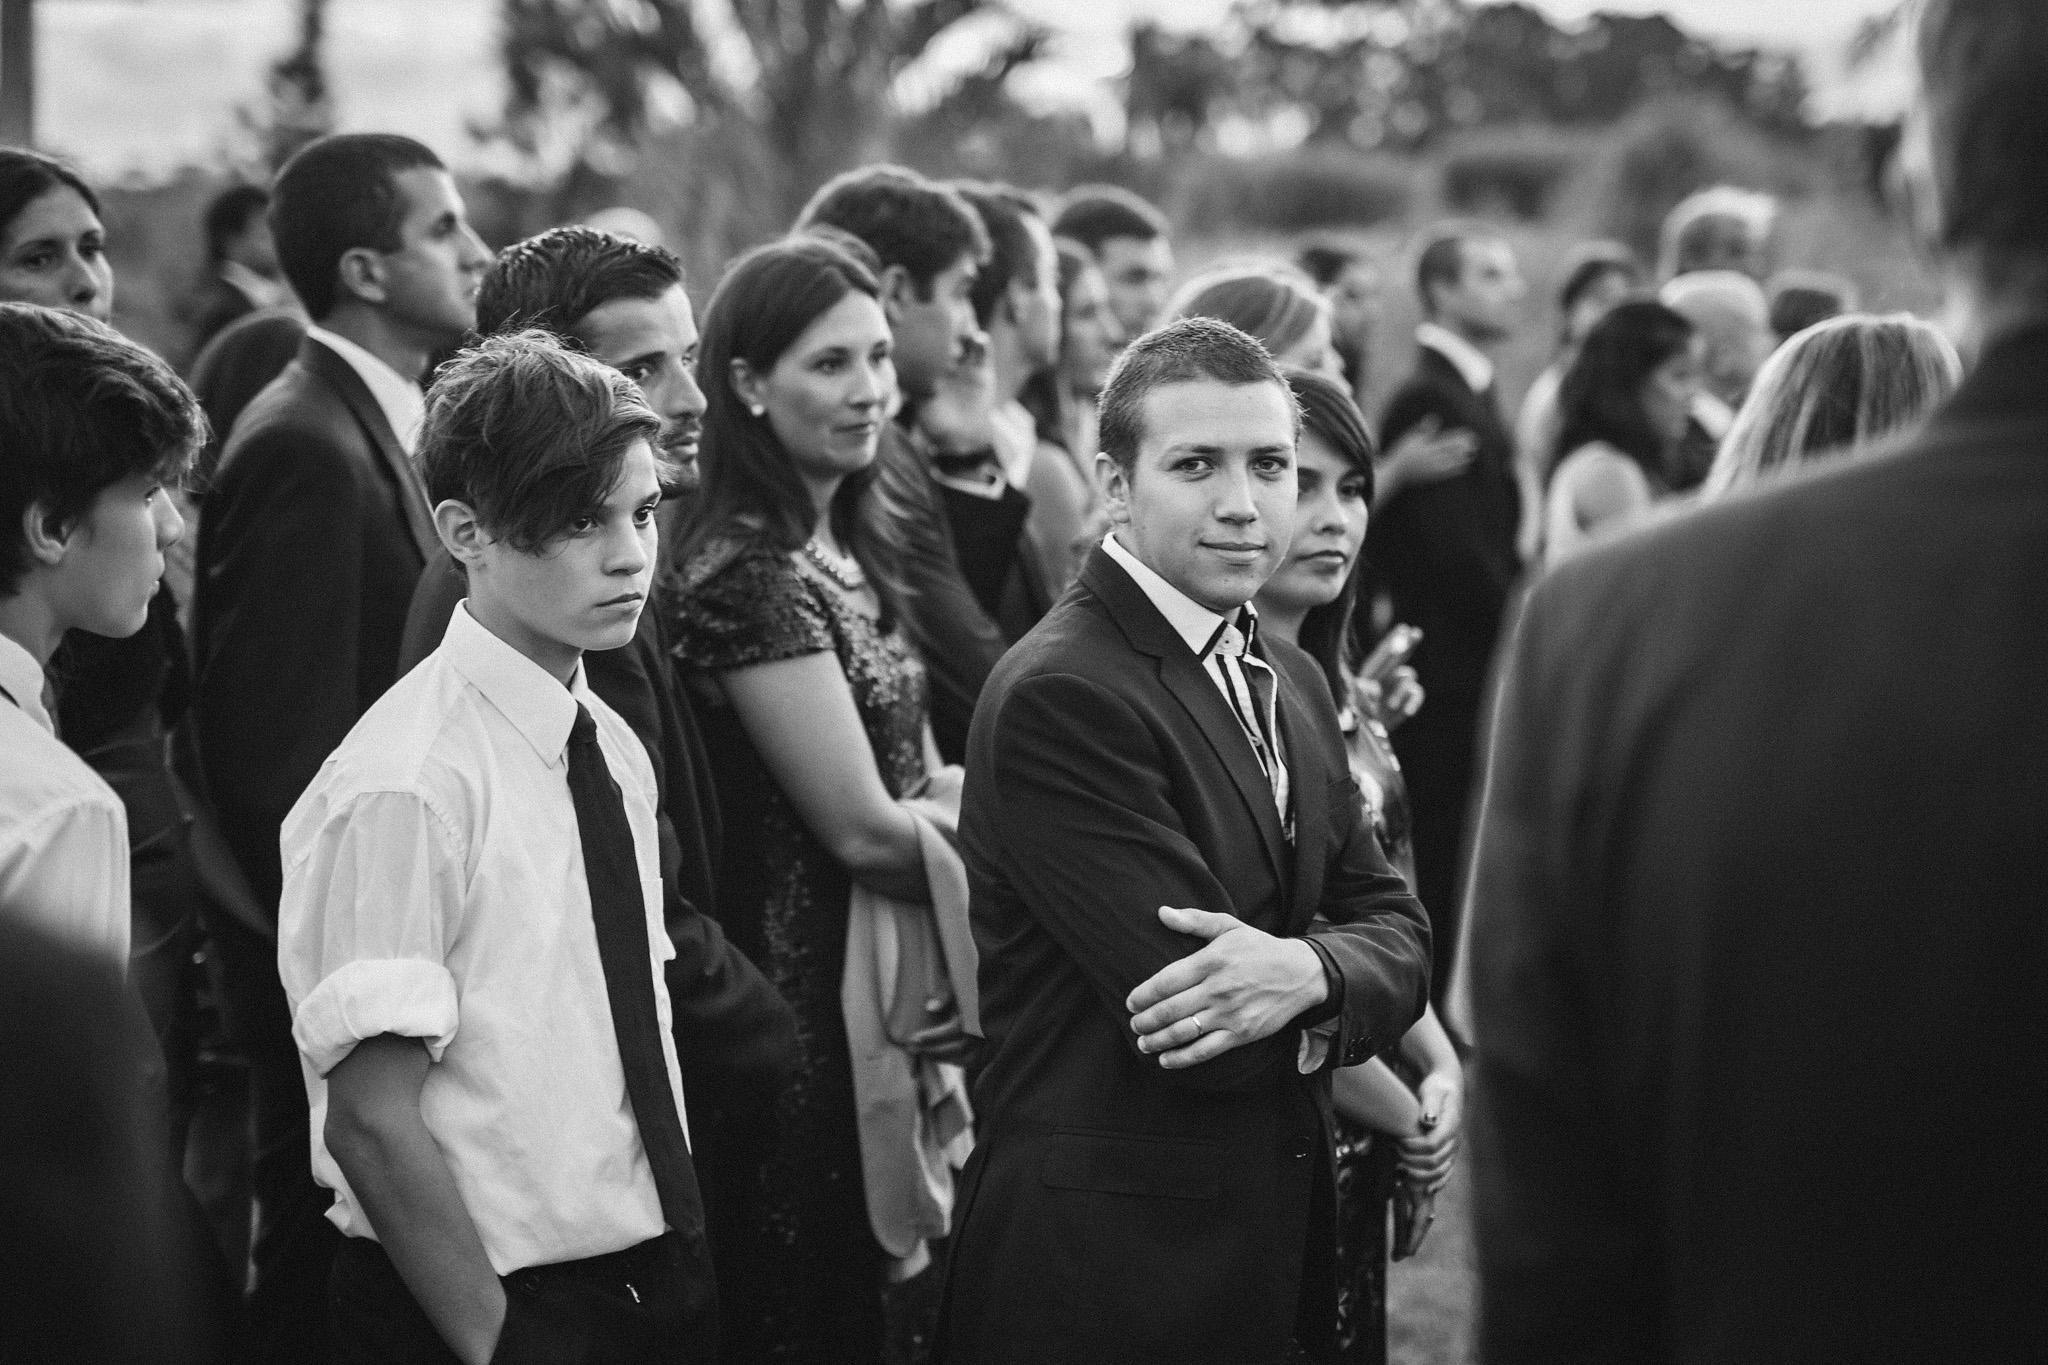 Wedding_Travellers_Destination_Wedding_Photography-34.jpg